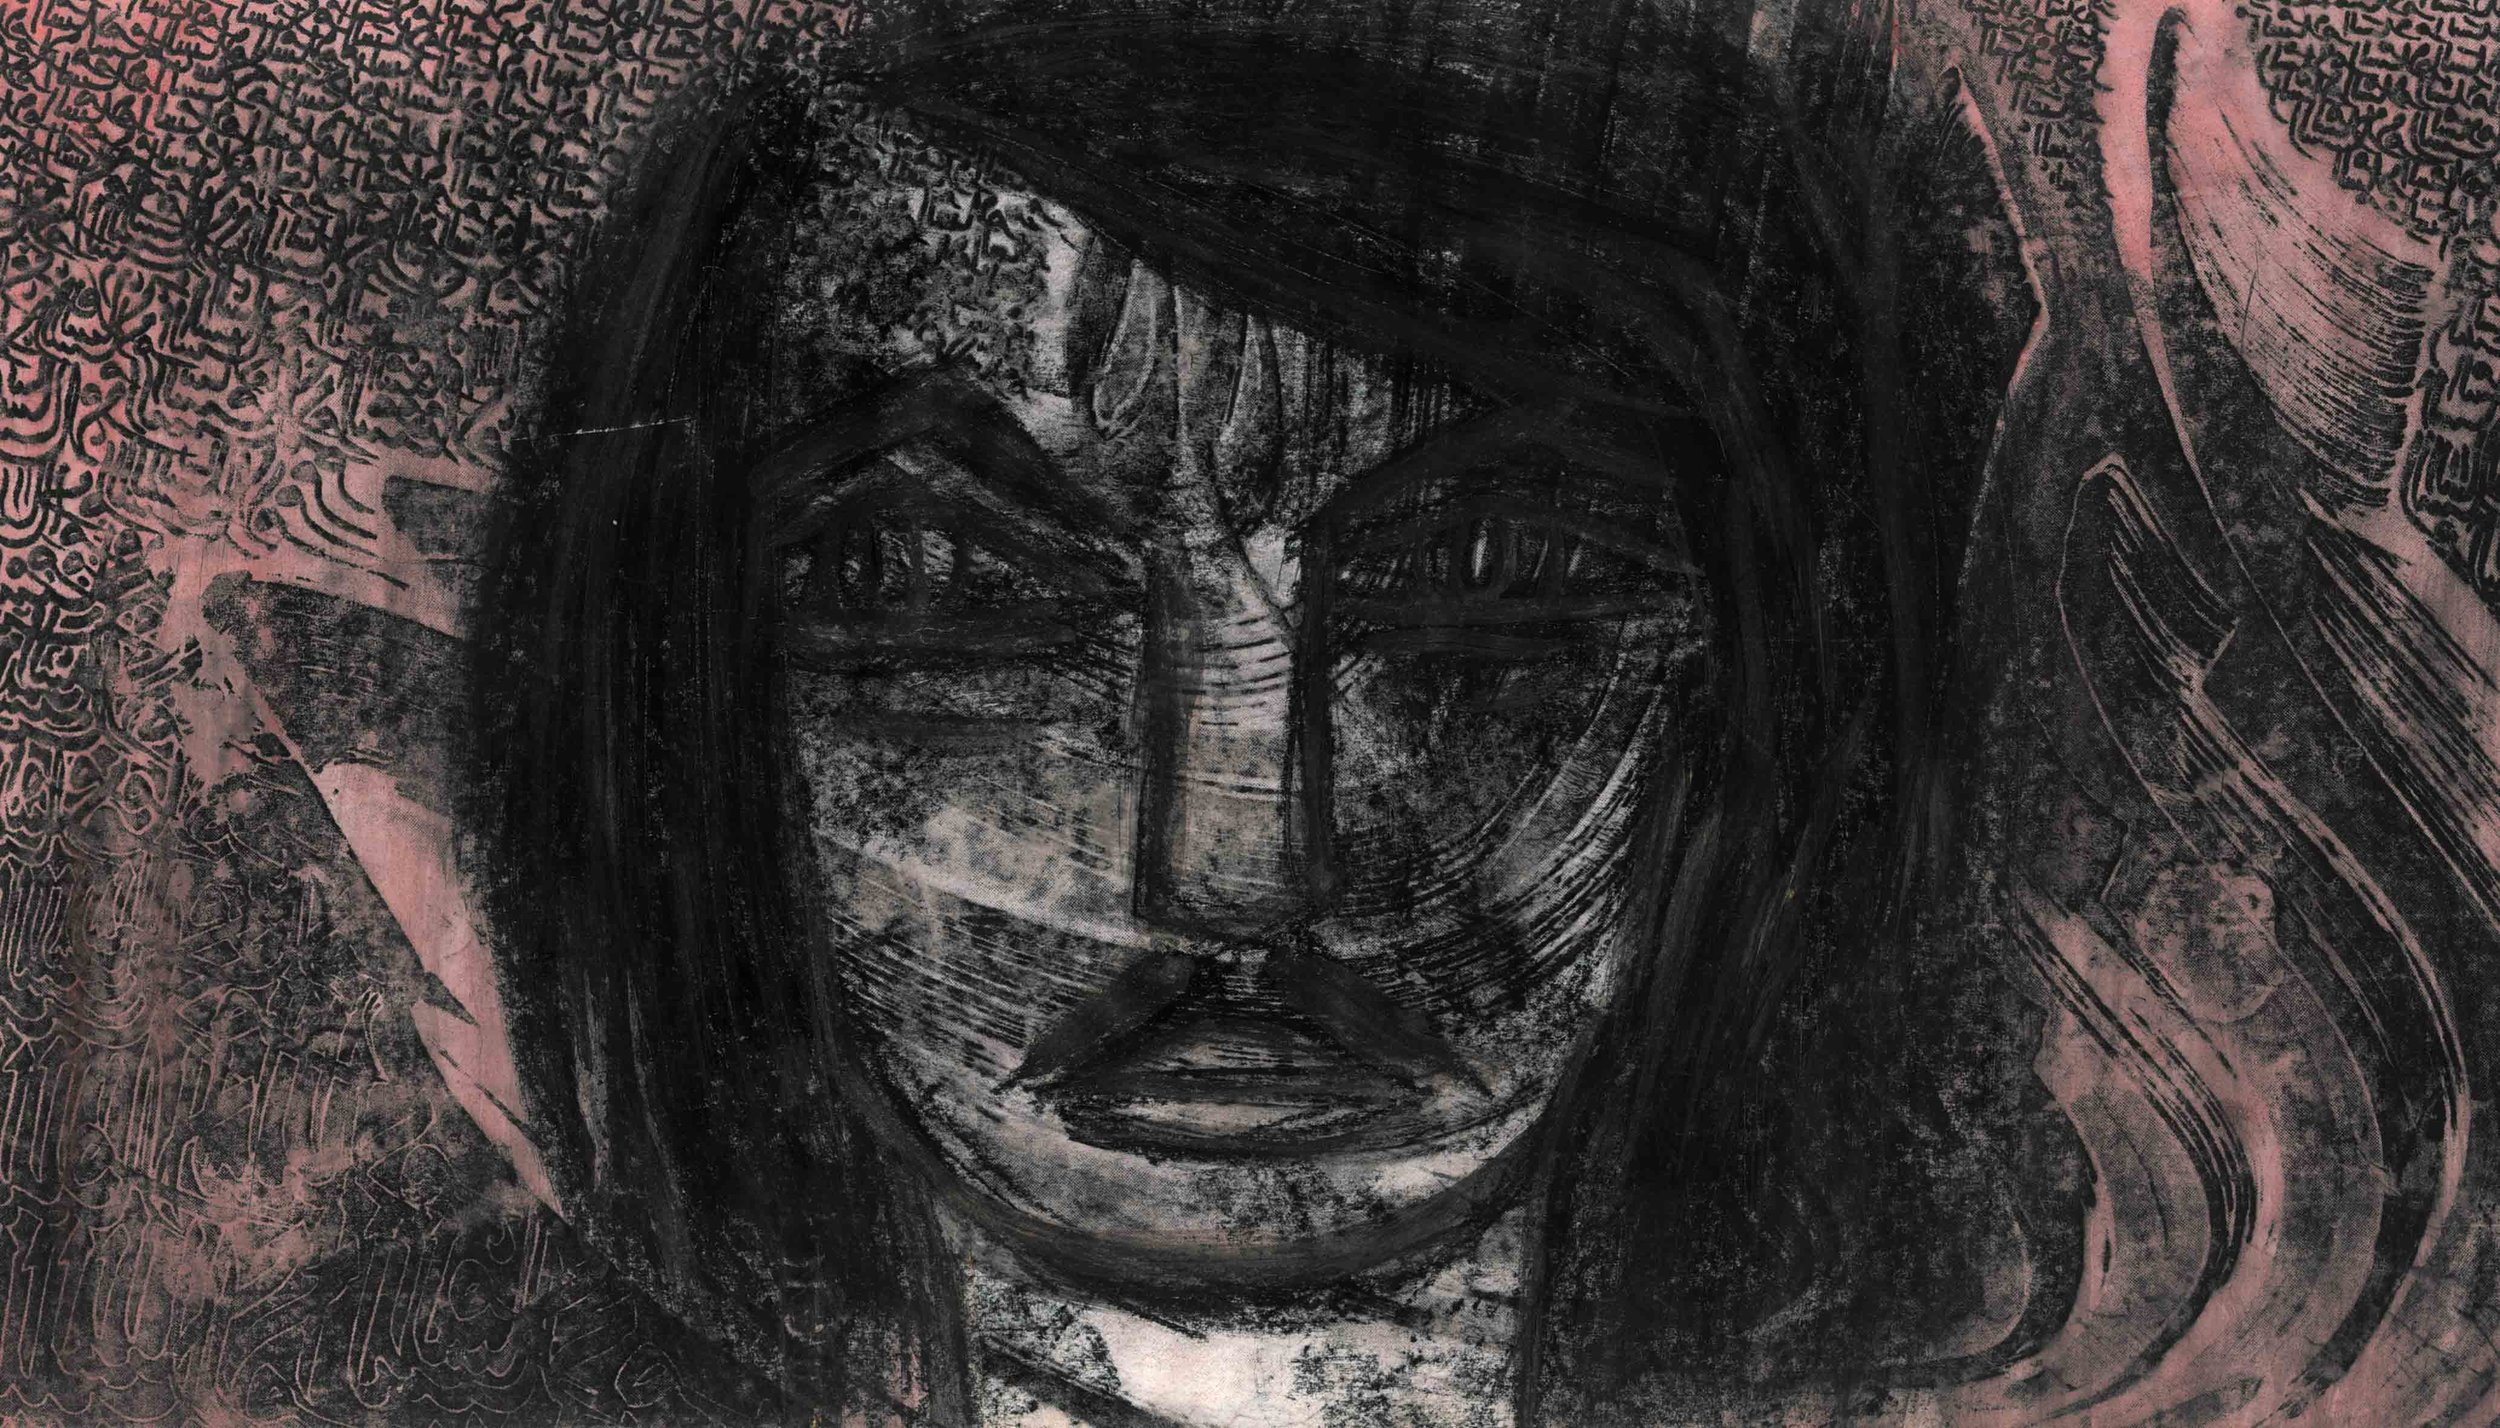 alfred_tarazi_fragments_silent_film_screen_34.jpg